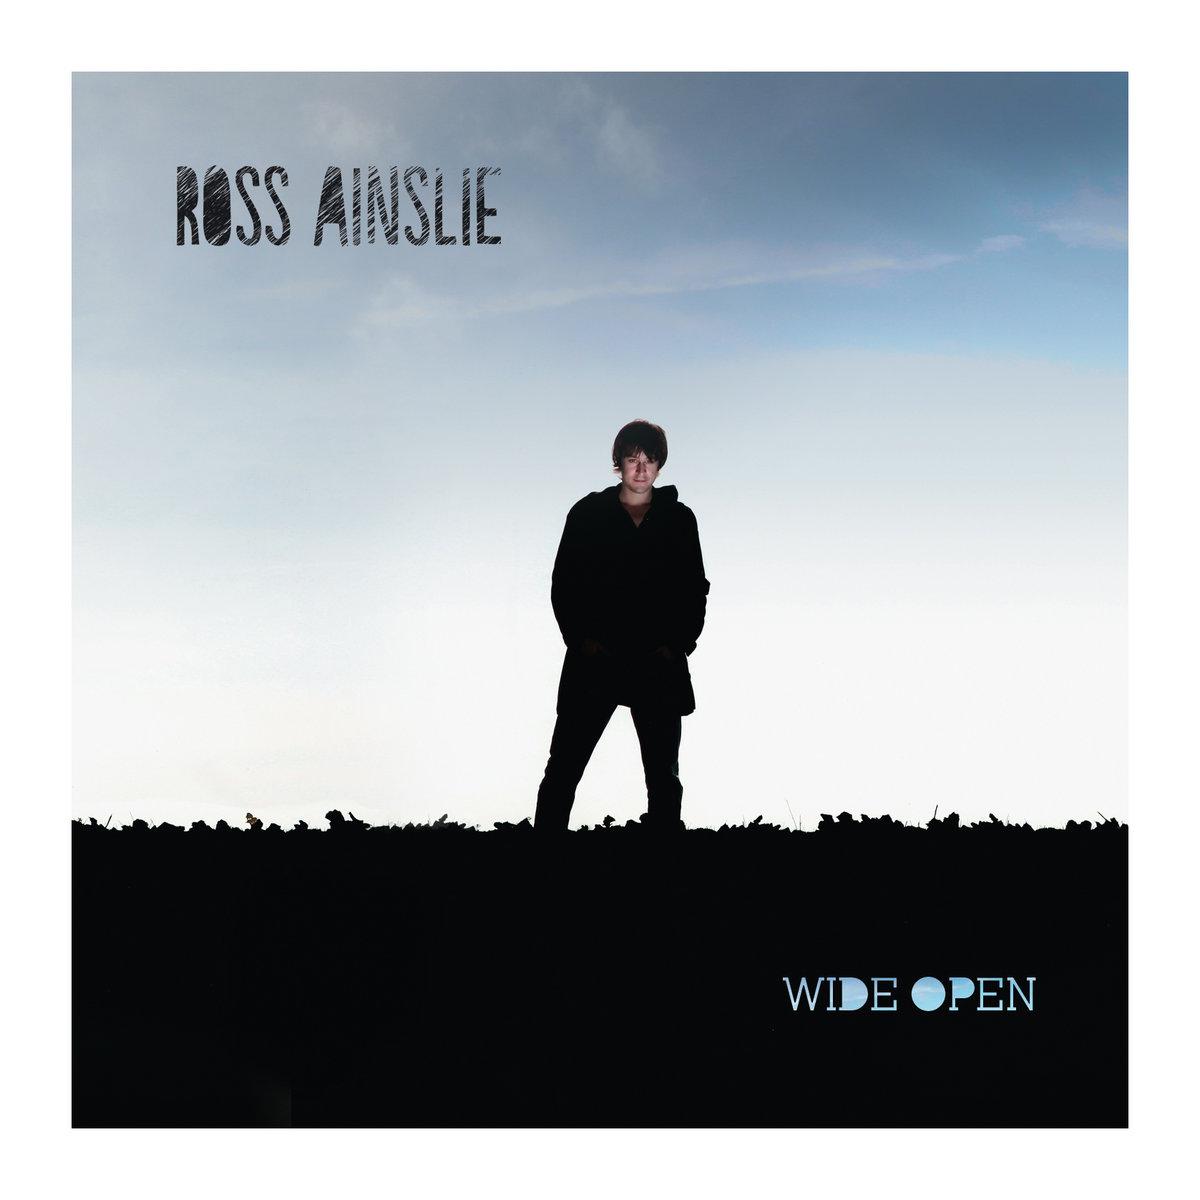 WIDE OPEN | Ross Ainslie